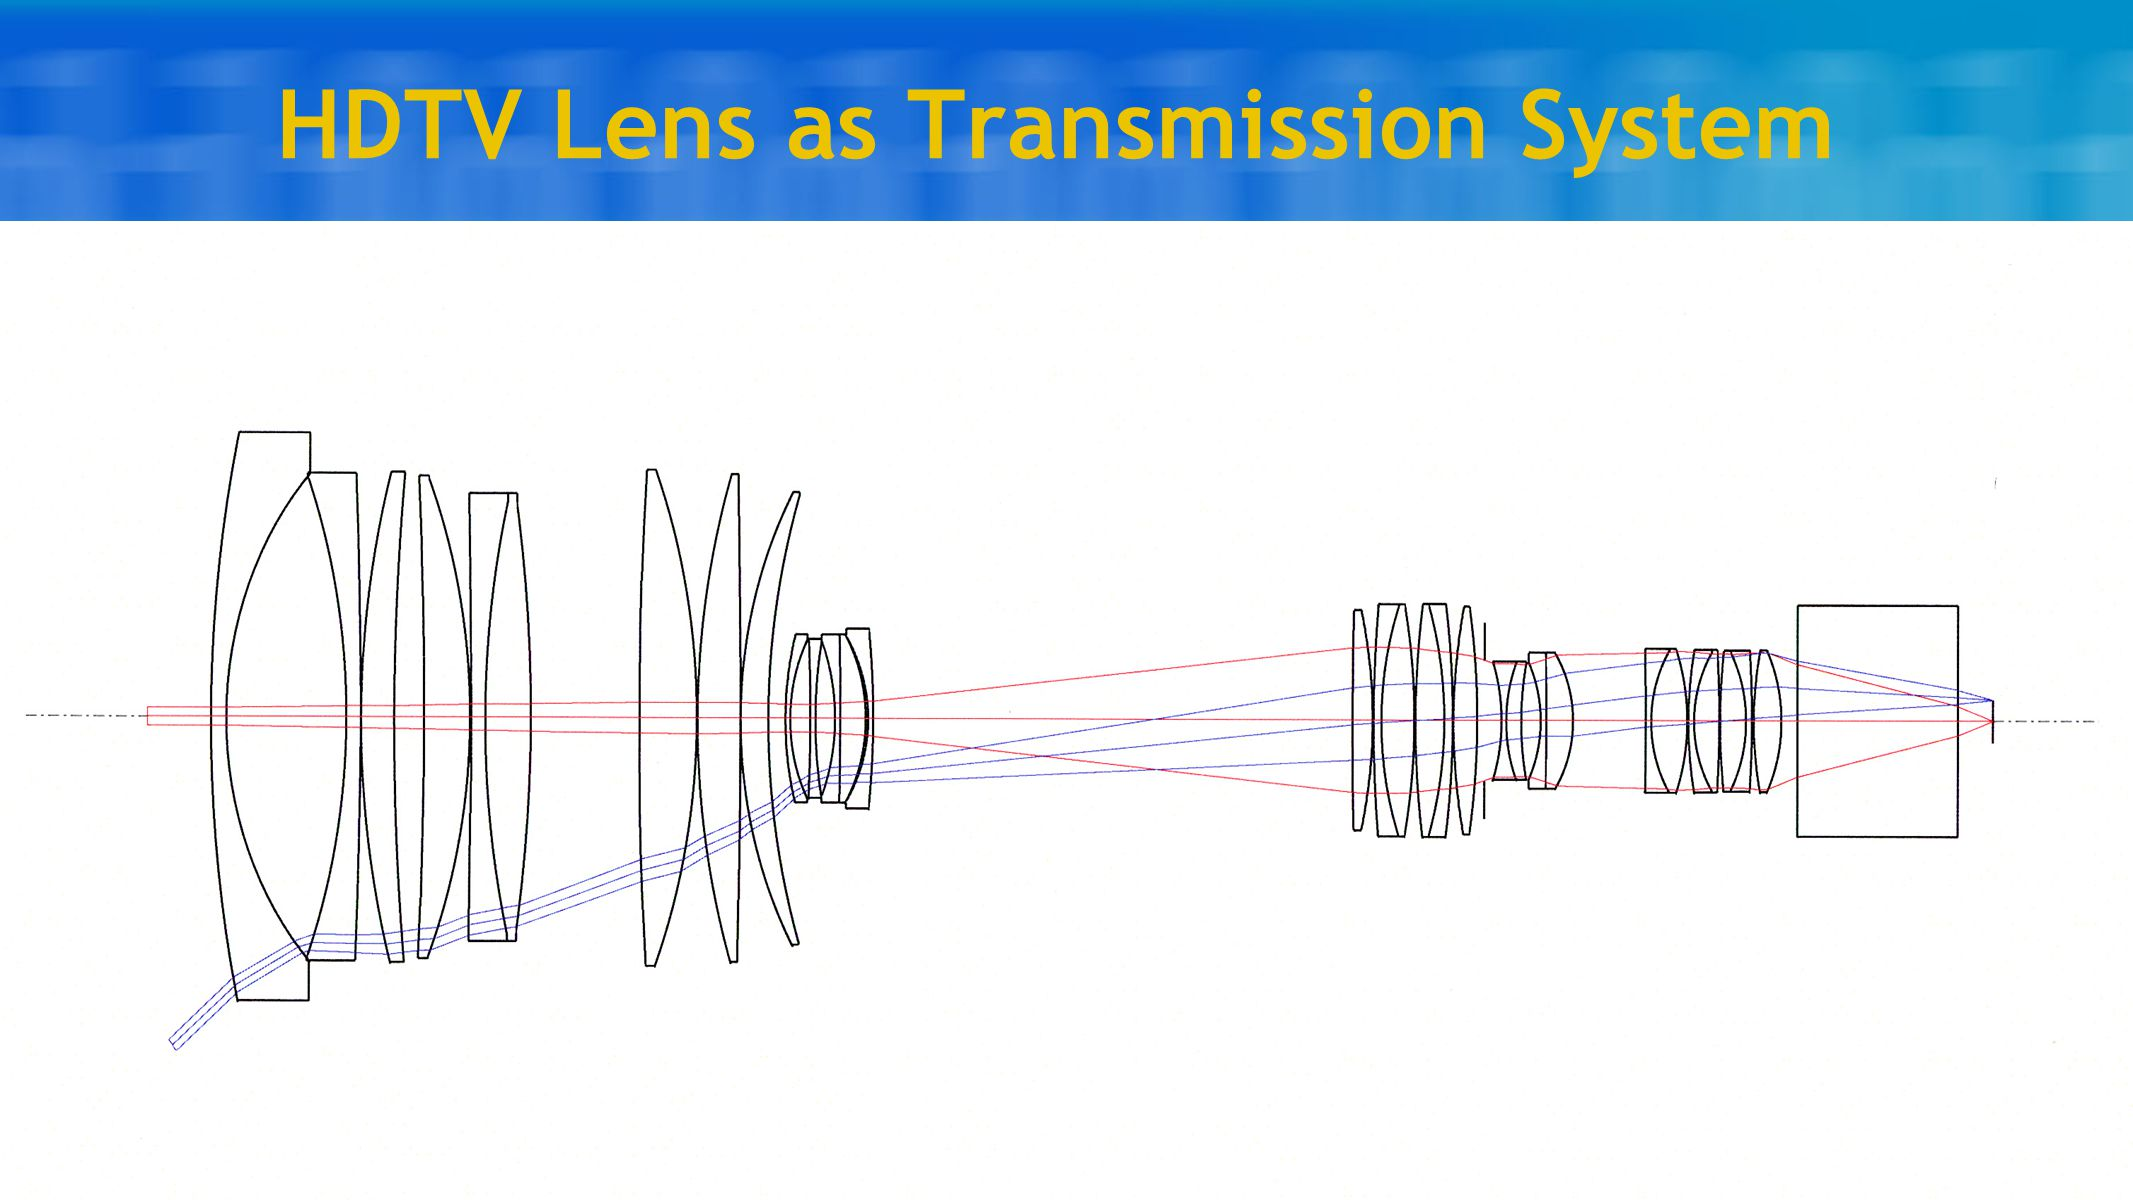 HDTV Lens as Transmission System